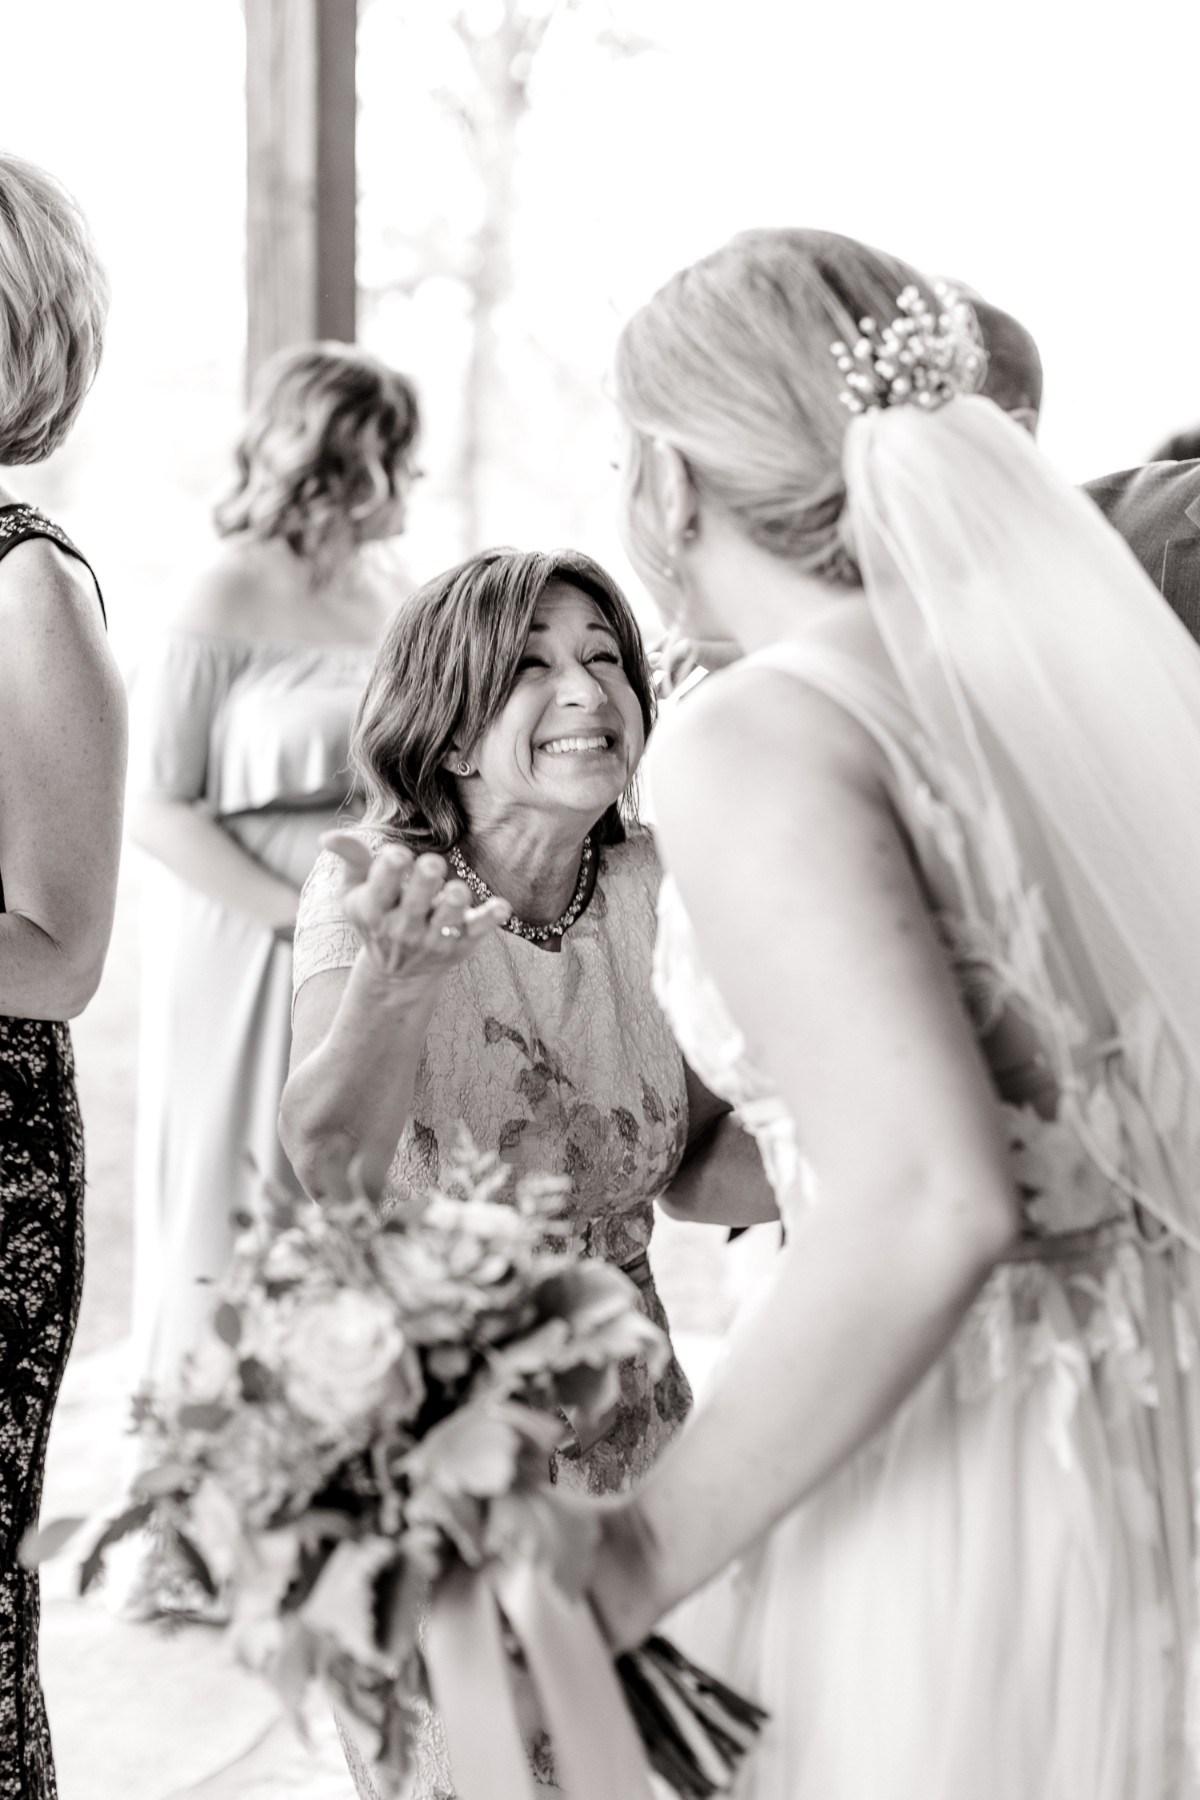 ennis-texas-wedding-photographer-kaitlyn-bullard-83.jpg